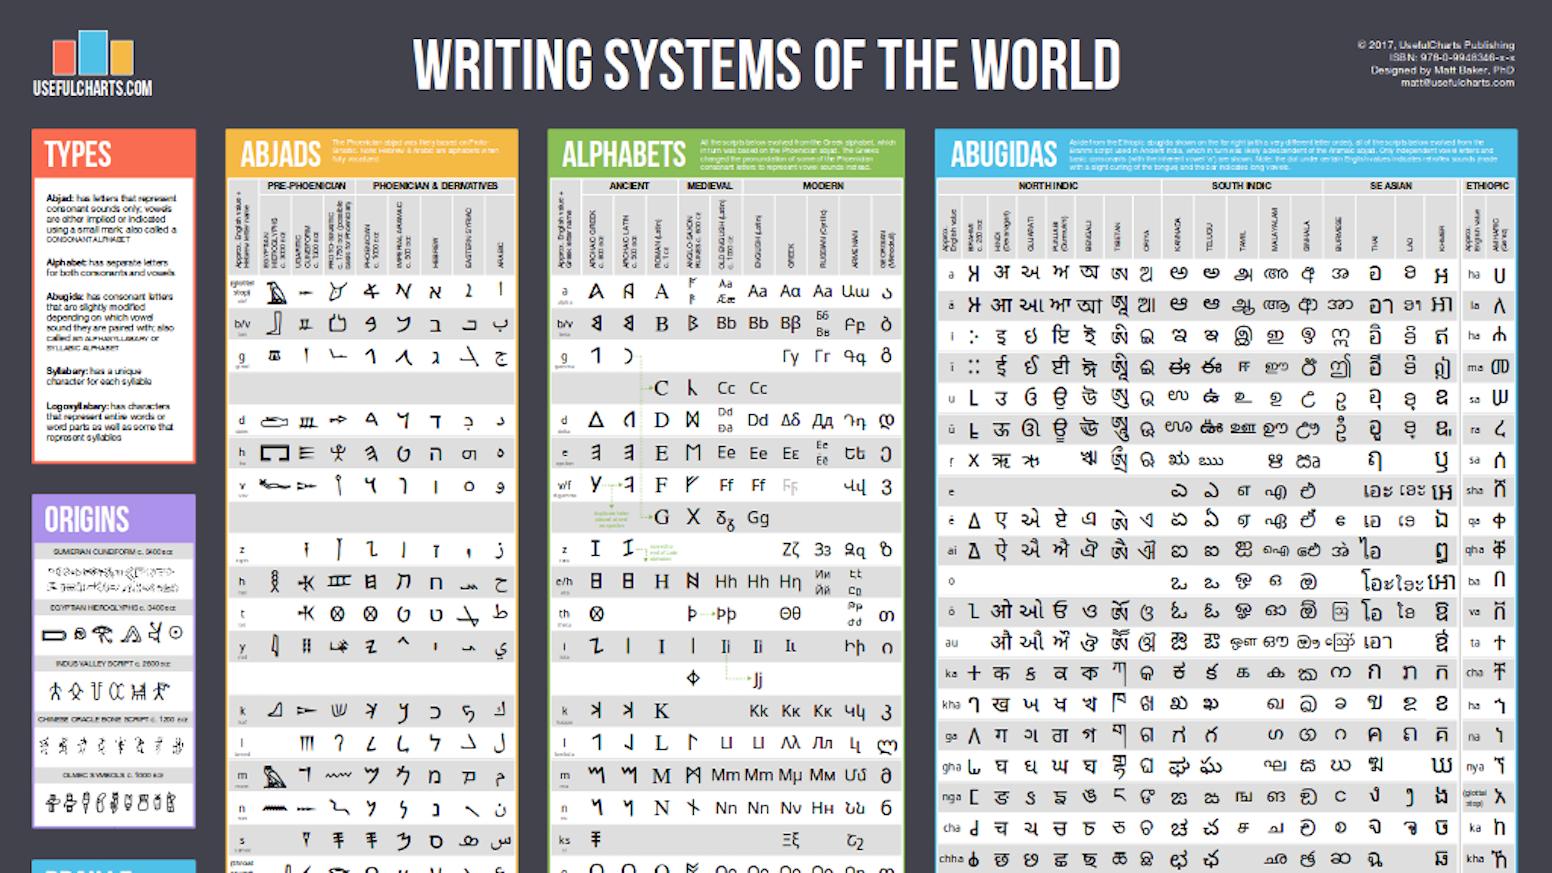 writing systems of the world postermatt baker —kickstarter